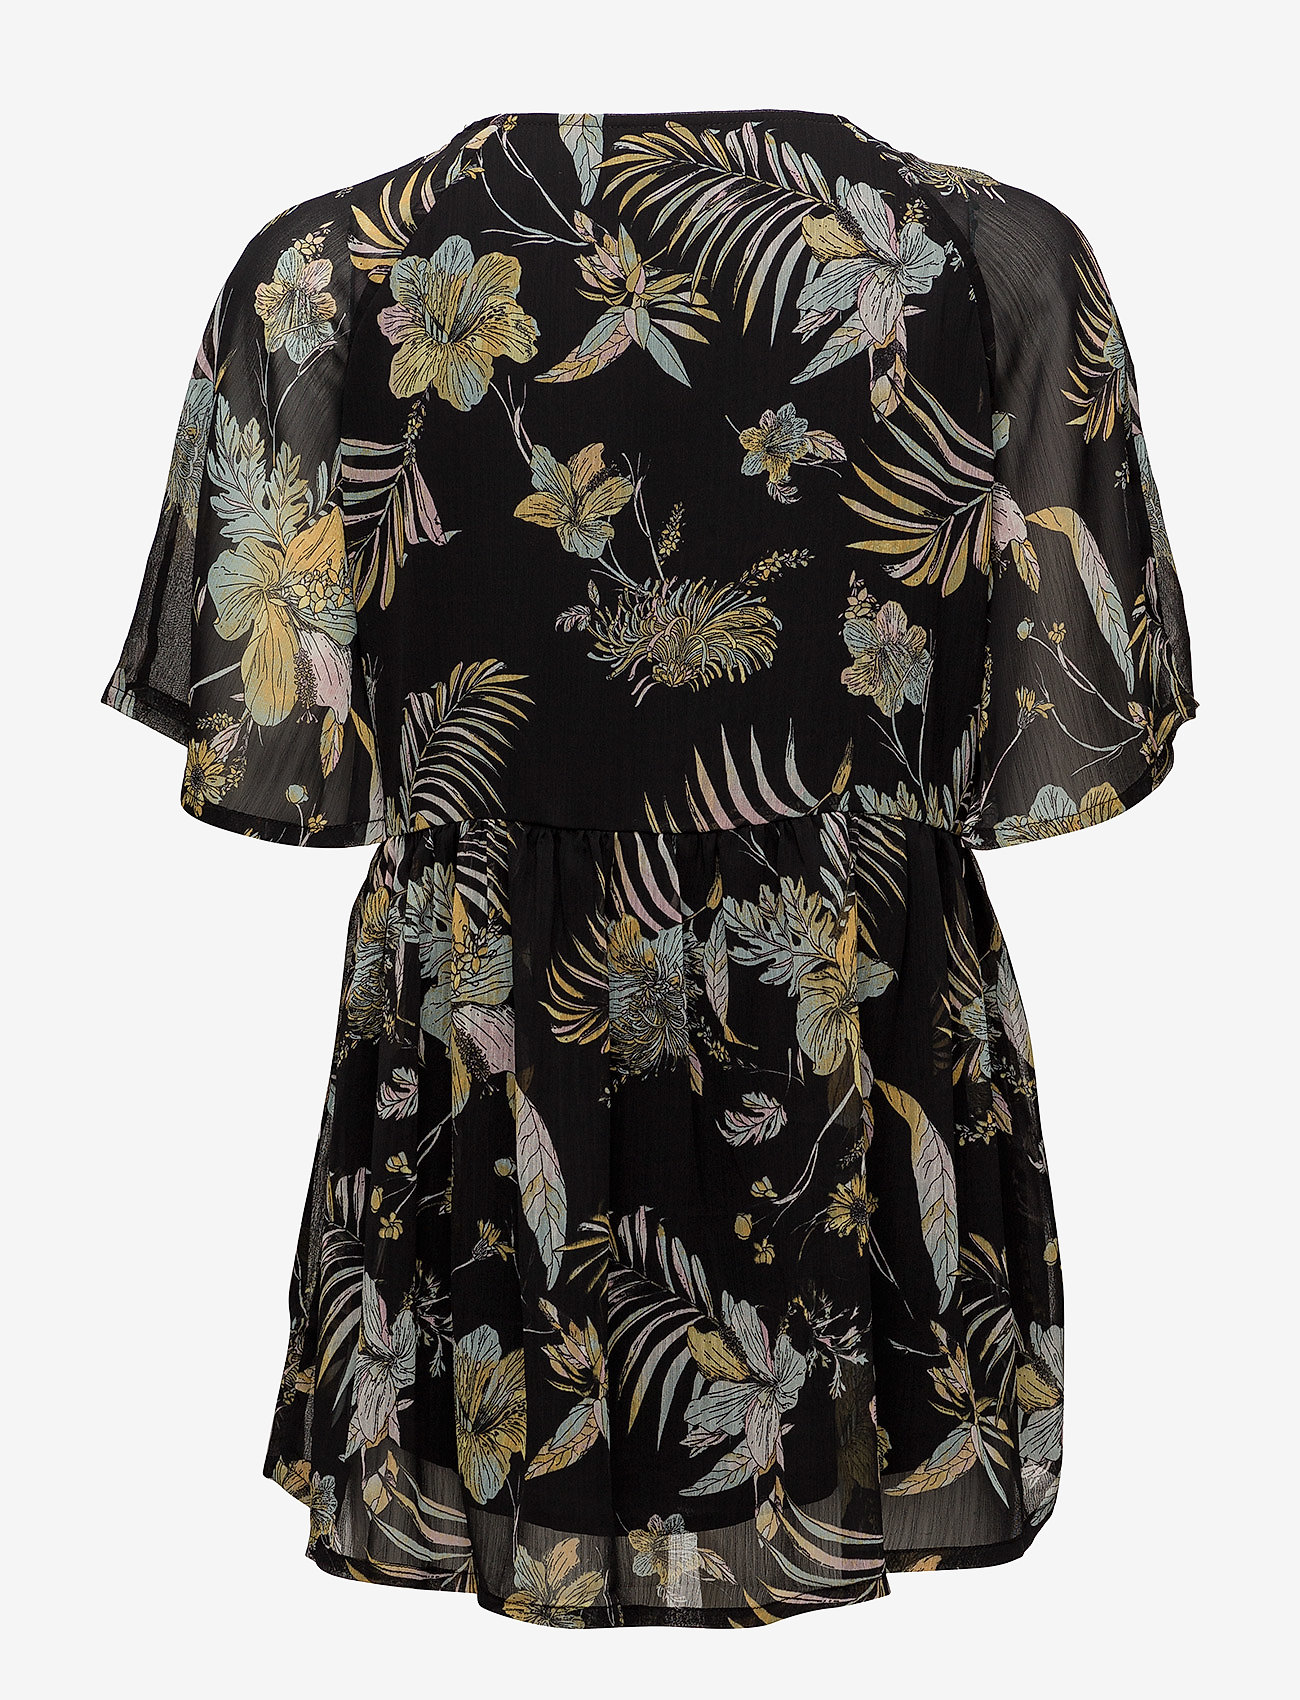 Gestuz - Maui ss top MS18 - short-sleeved blouses - black palm - 1